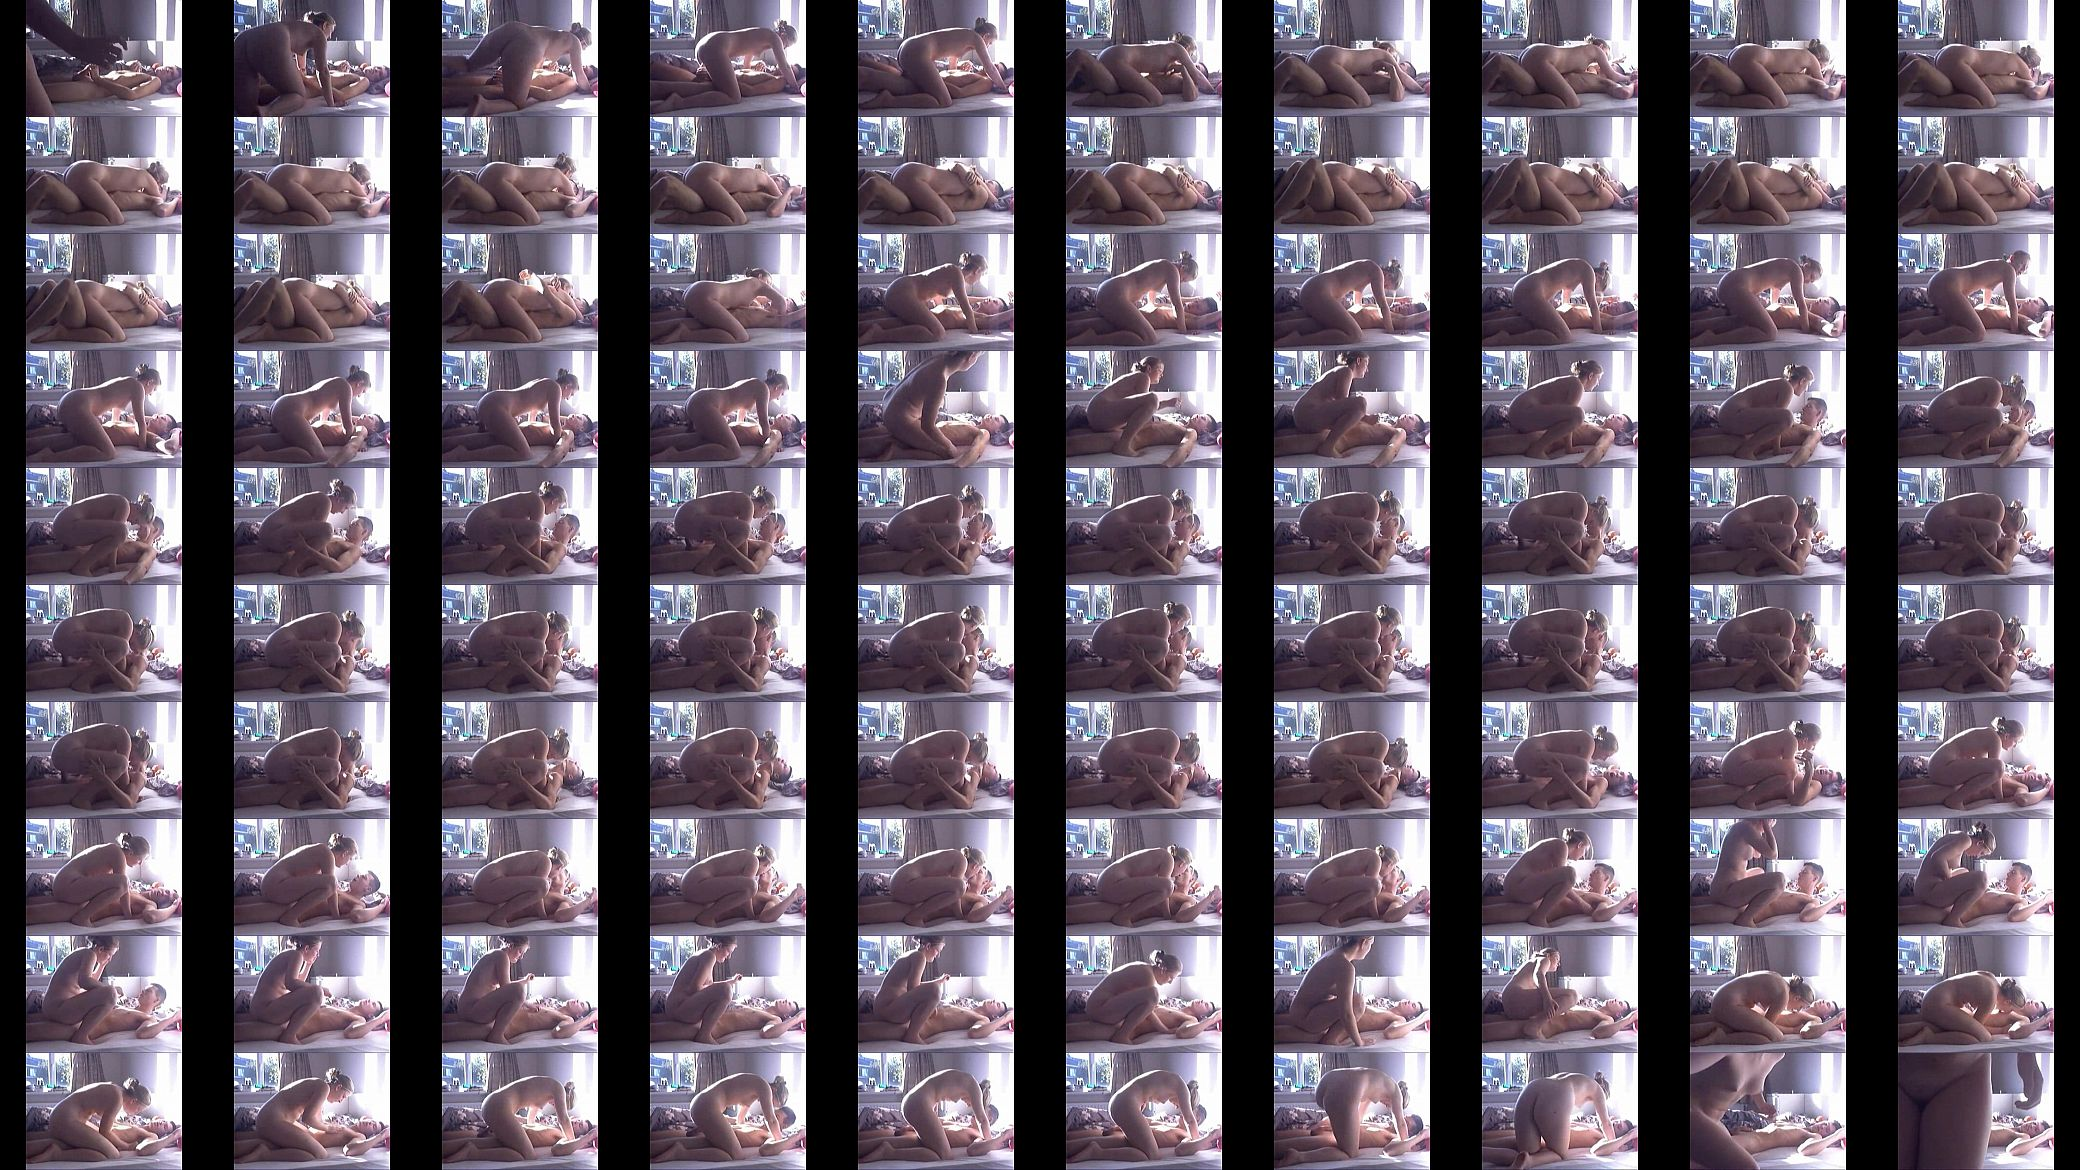 Webcam Full Package